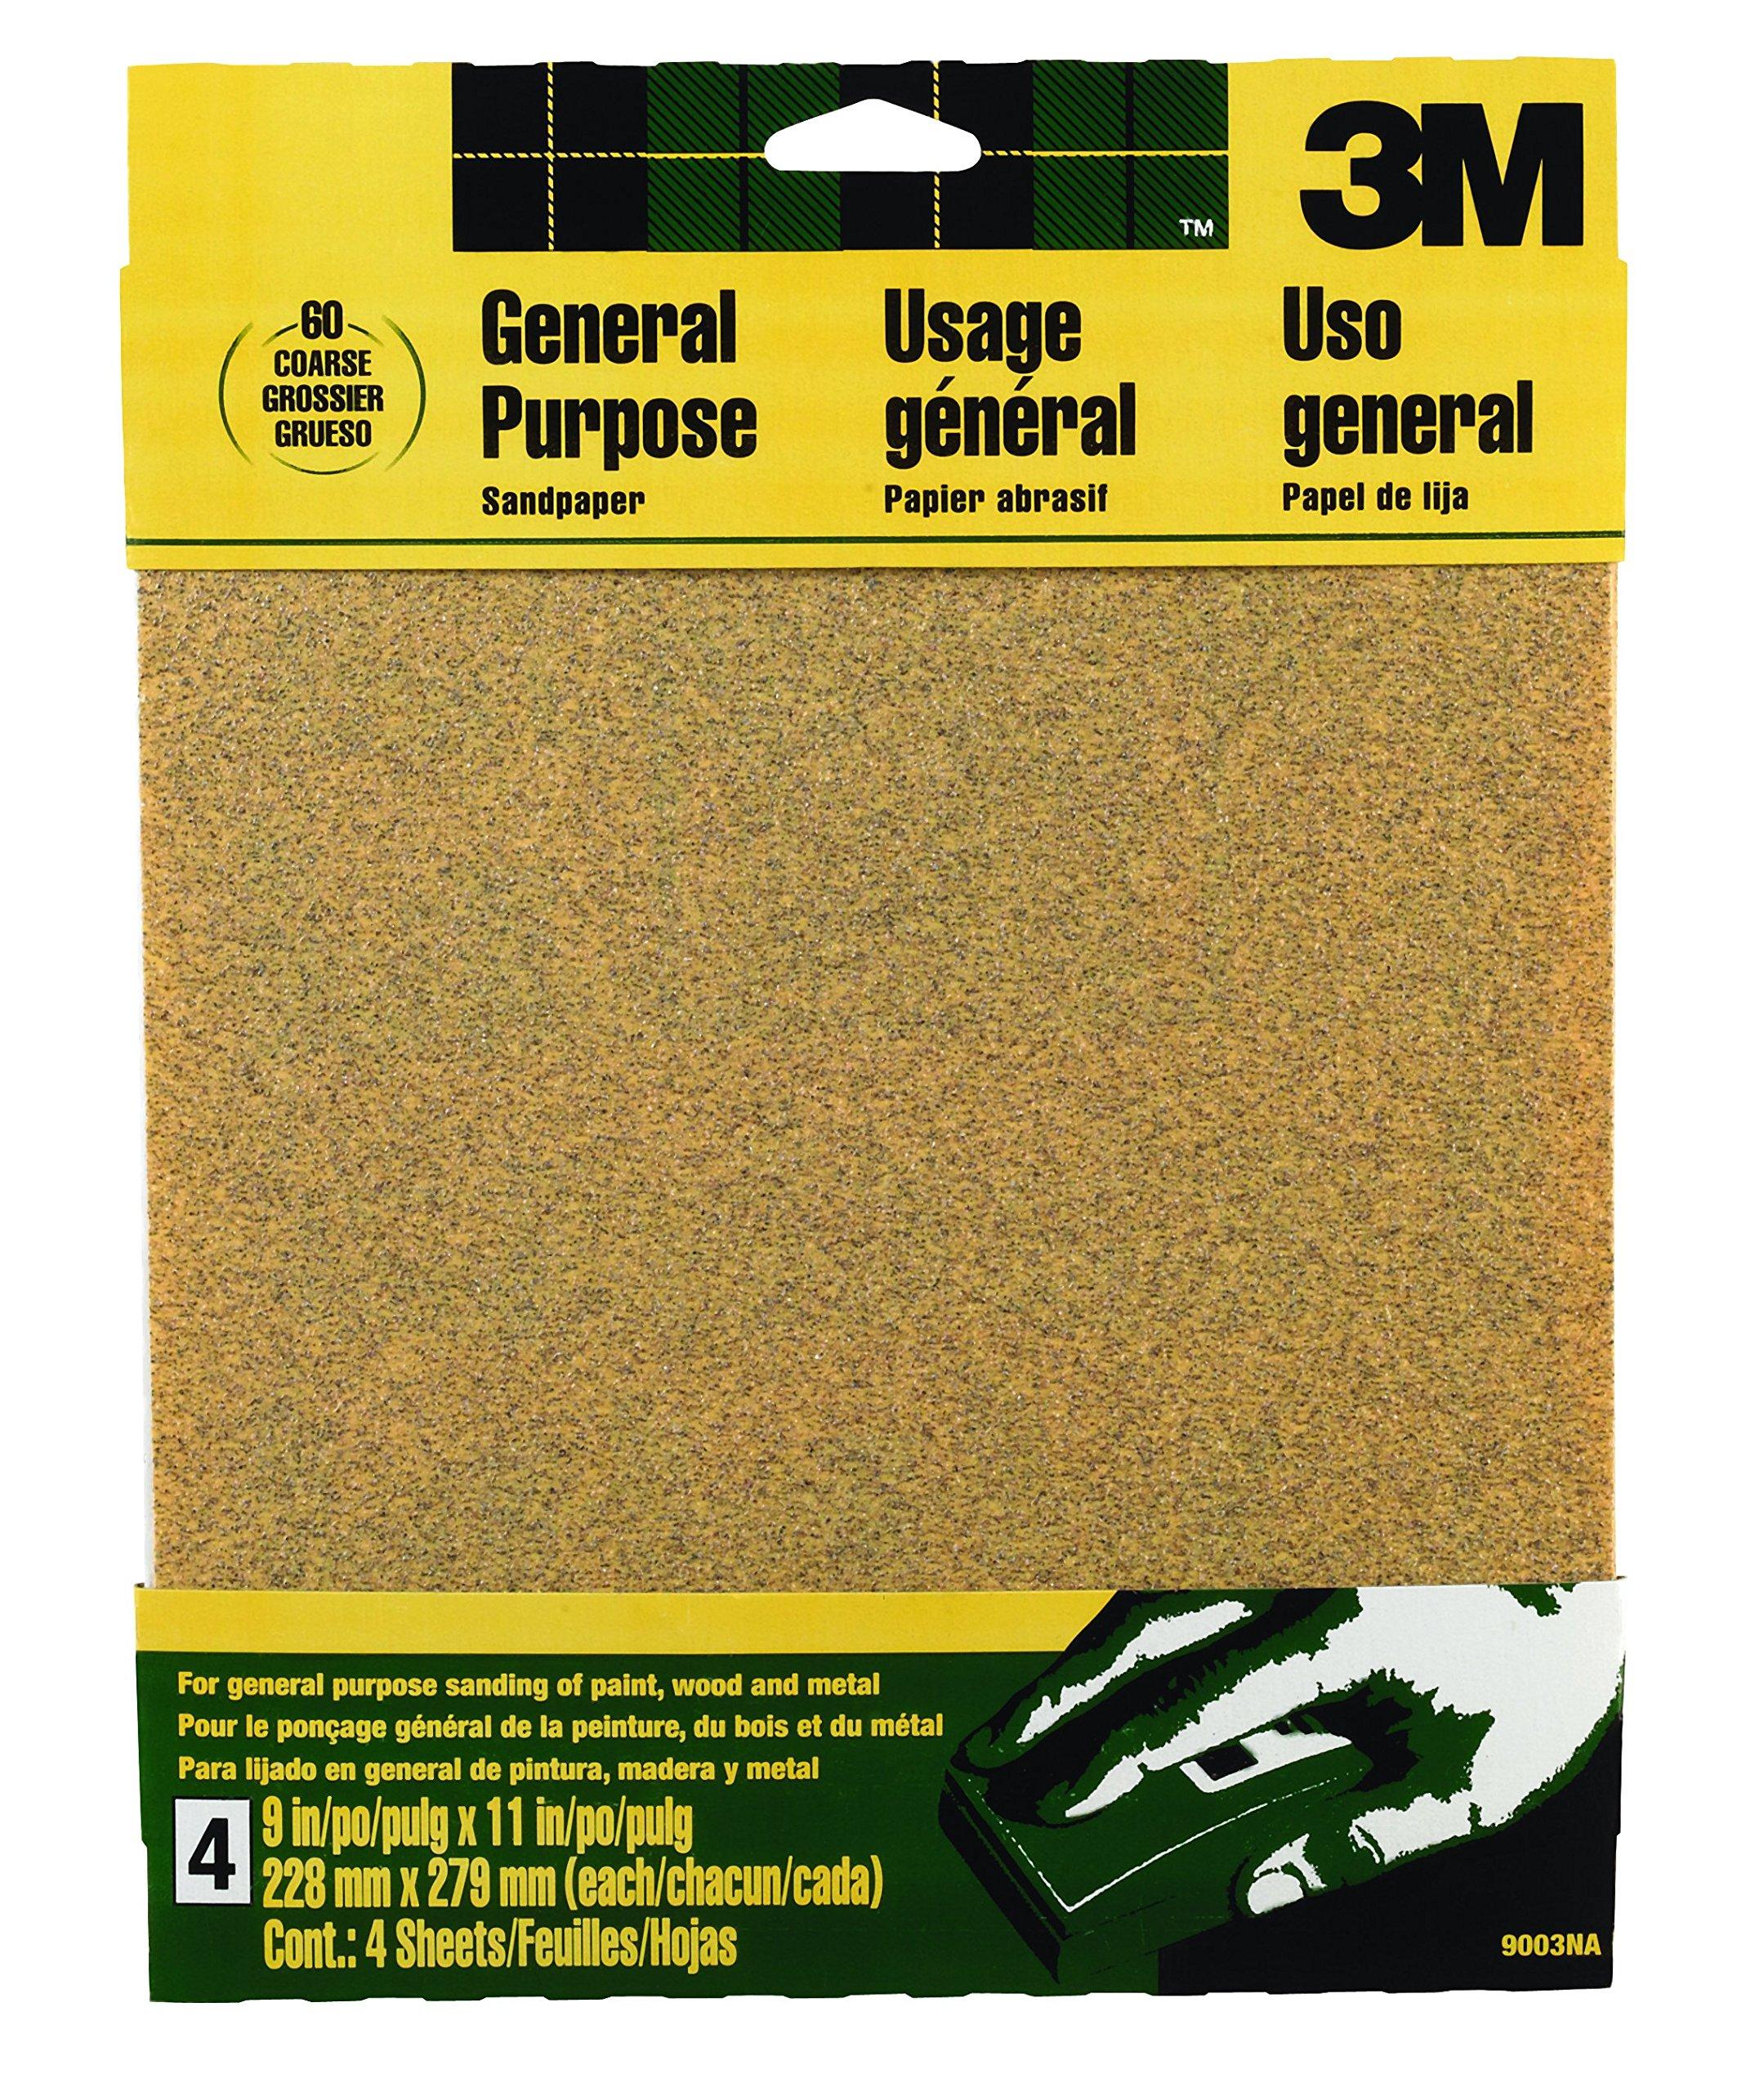 15 Sheets Total 9-Inch x 11-Inch Norton 02616 3X Handy Aluminum-Oxide Sandpaper 220 Grit 5 Pack